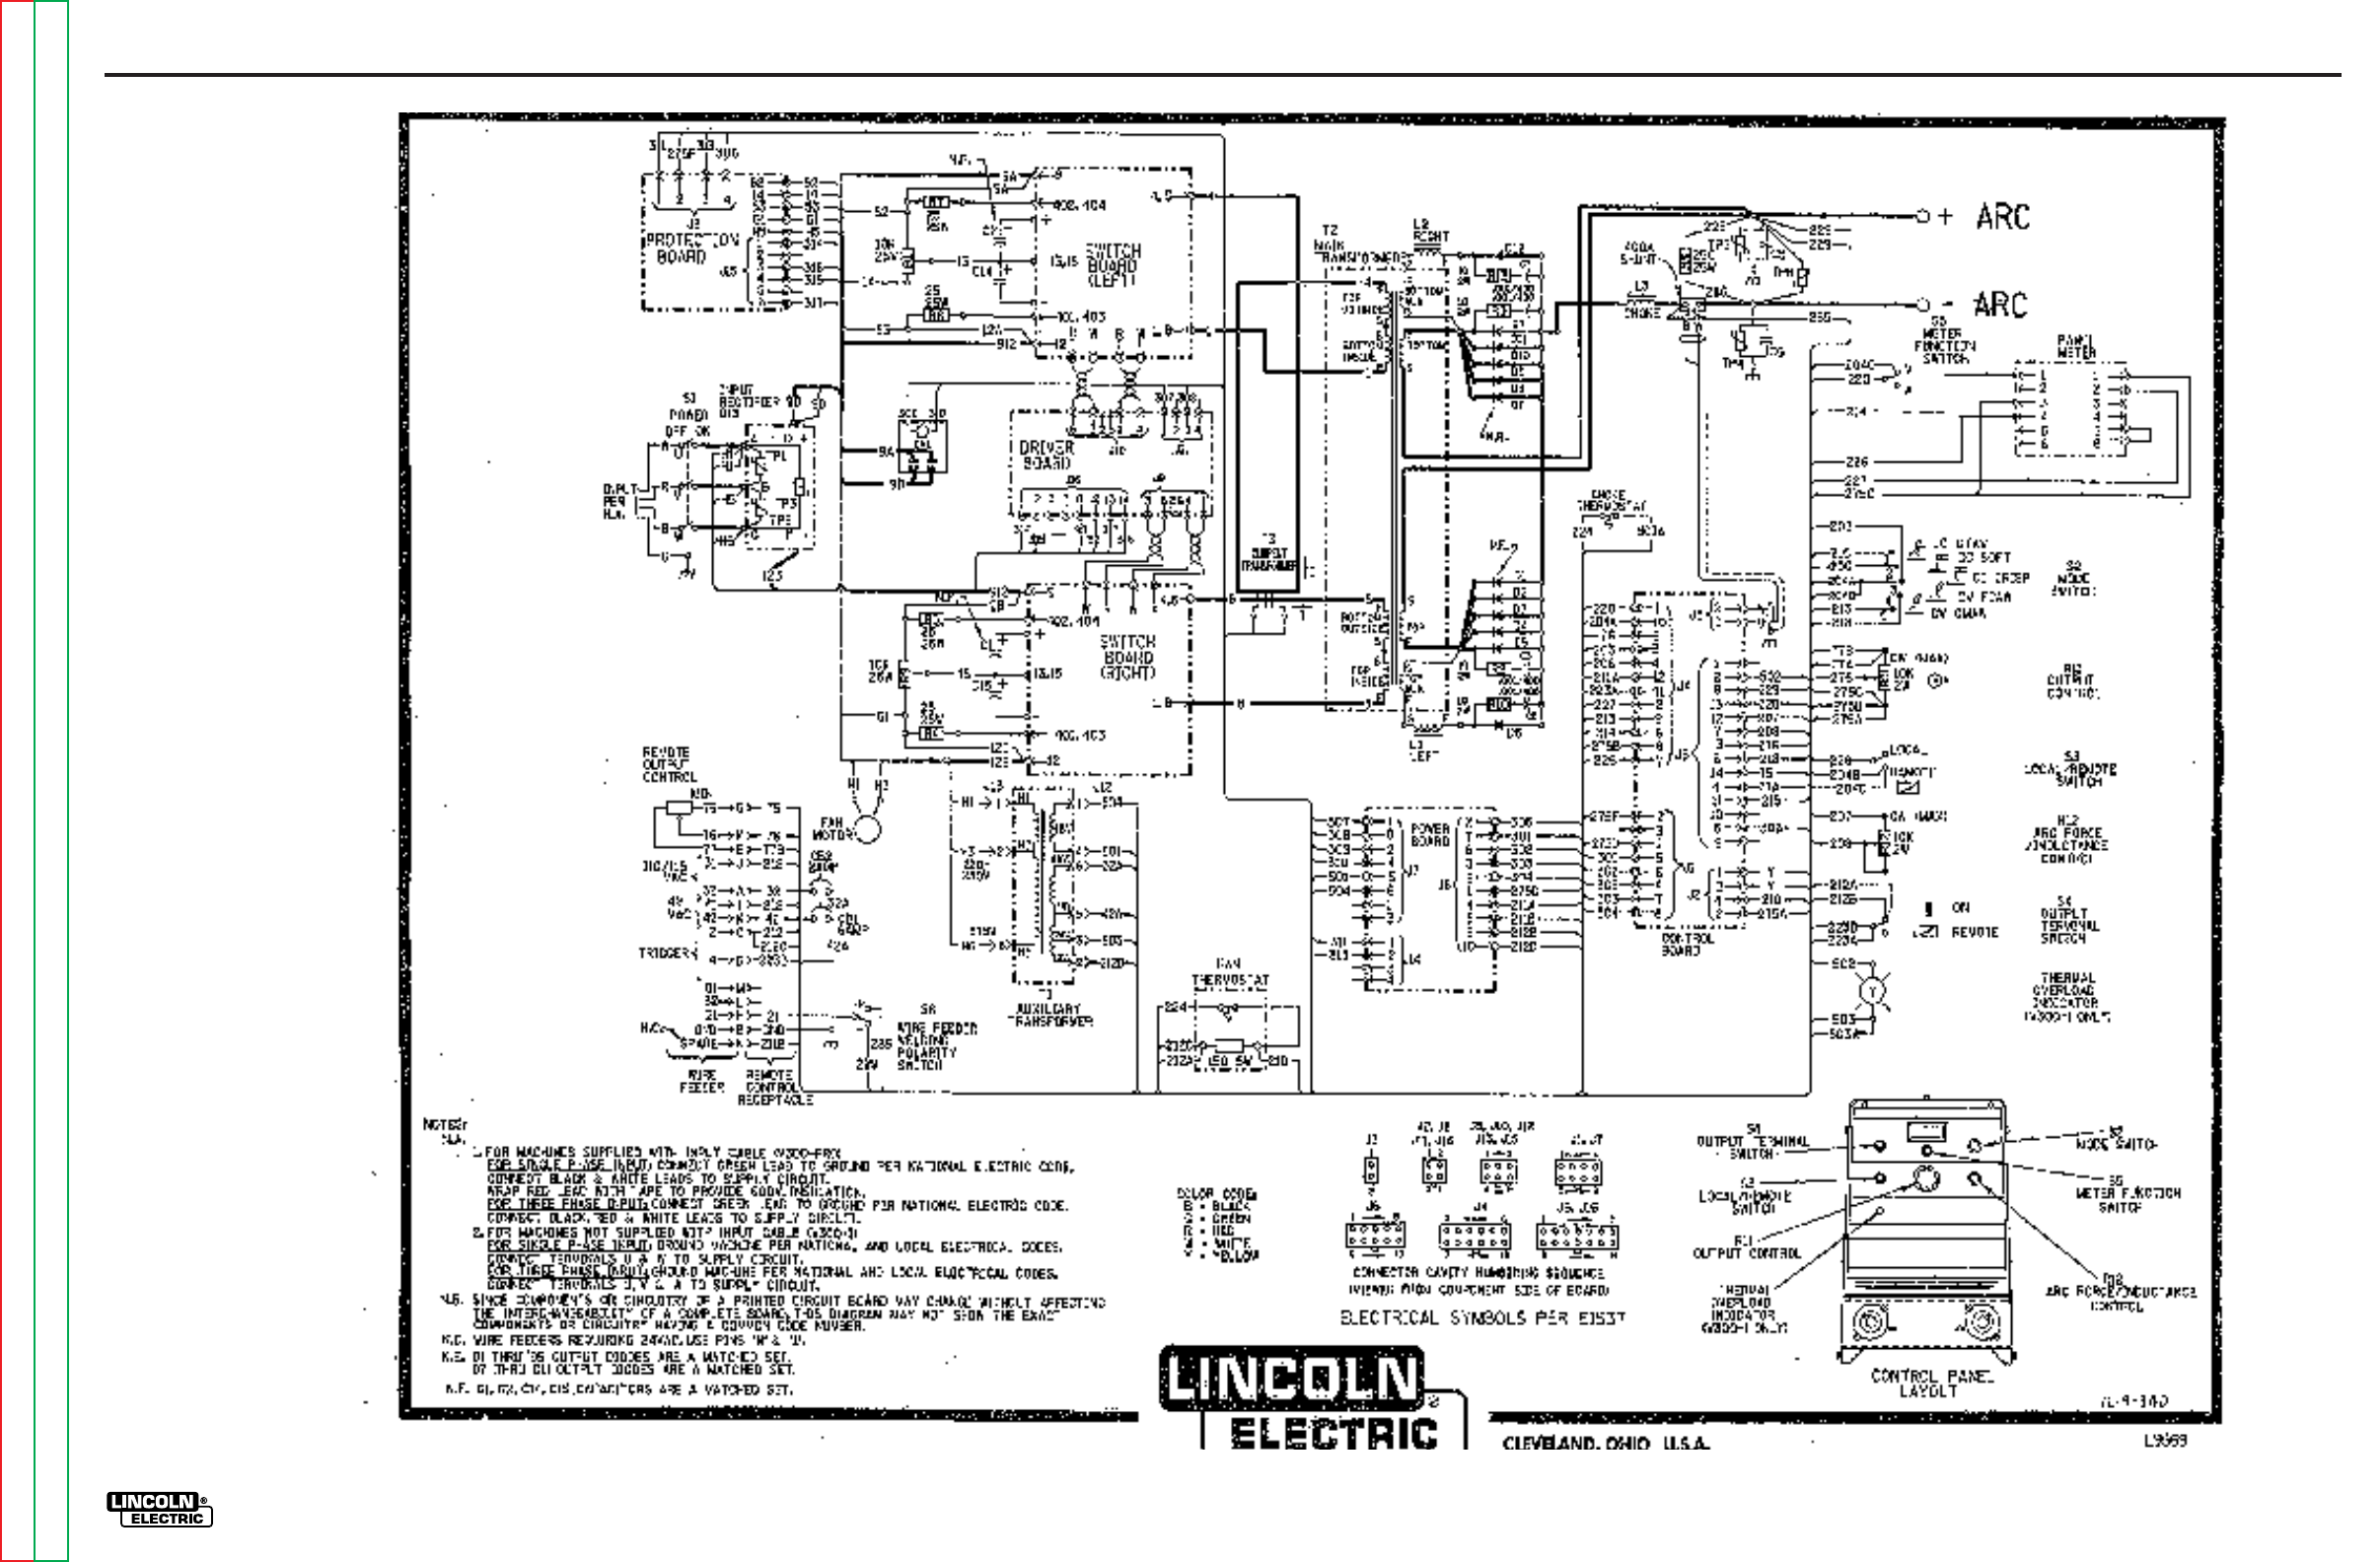 Lincoln Air Vantage 500 Wiring Diagram Welding Machines Motorola Alternator 9db2lj2b58 256 Schematic Electrical Diagrams On Engine